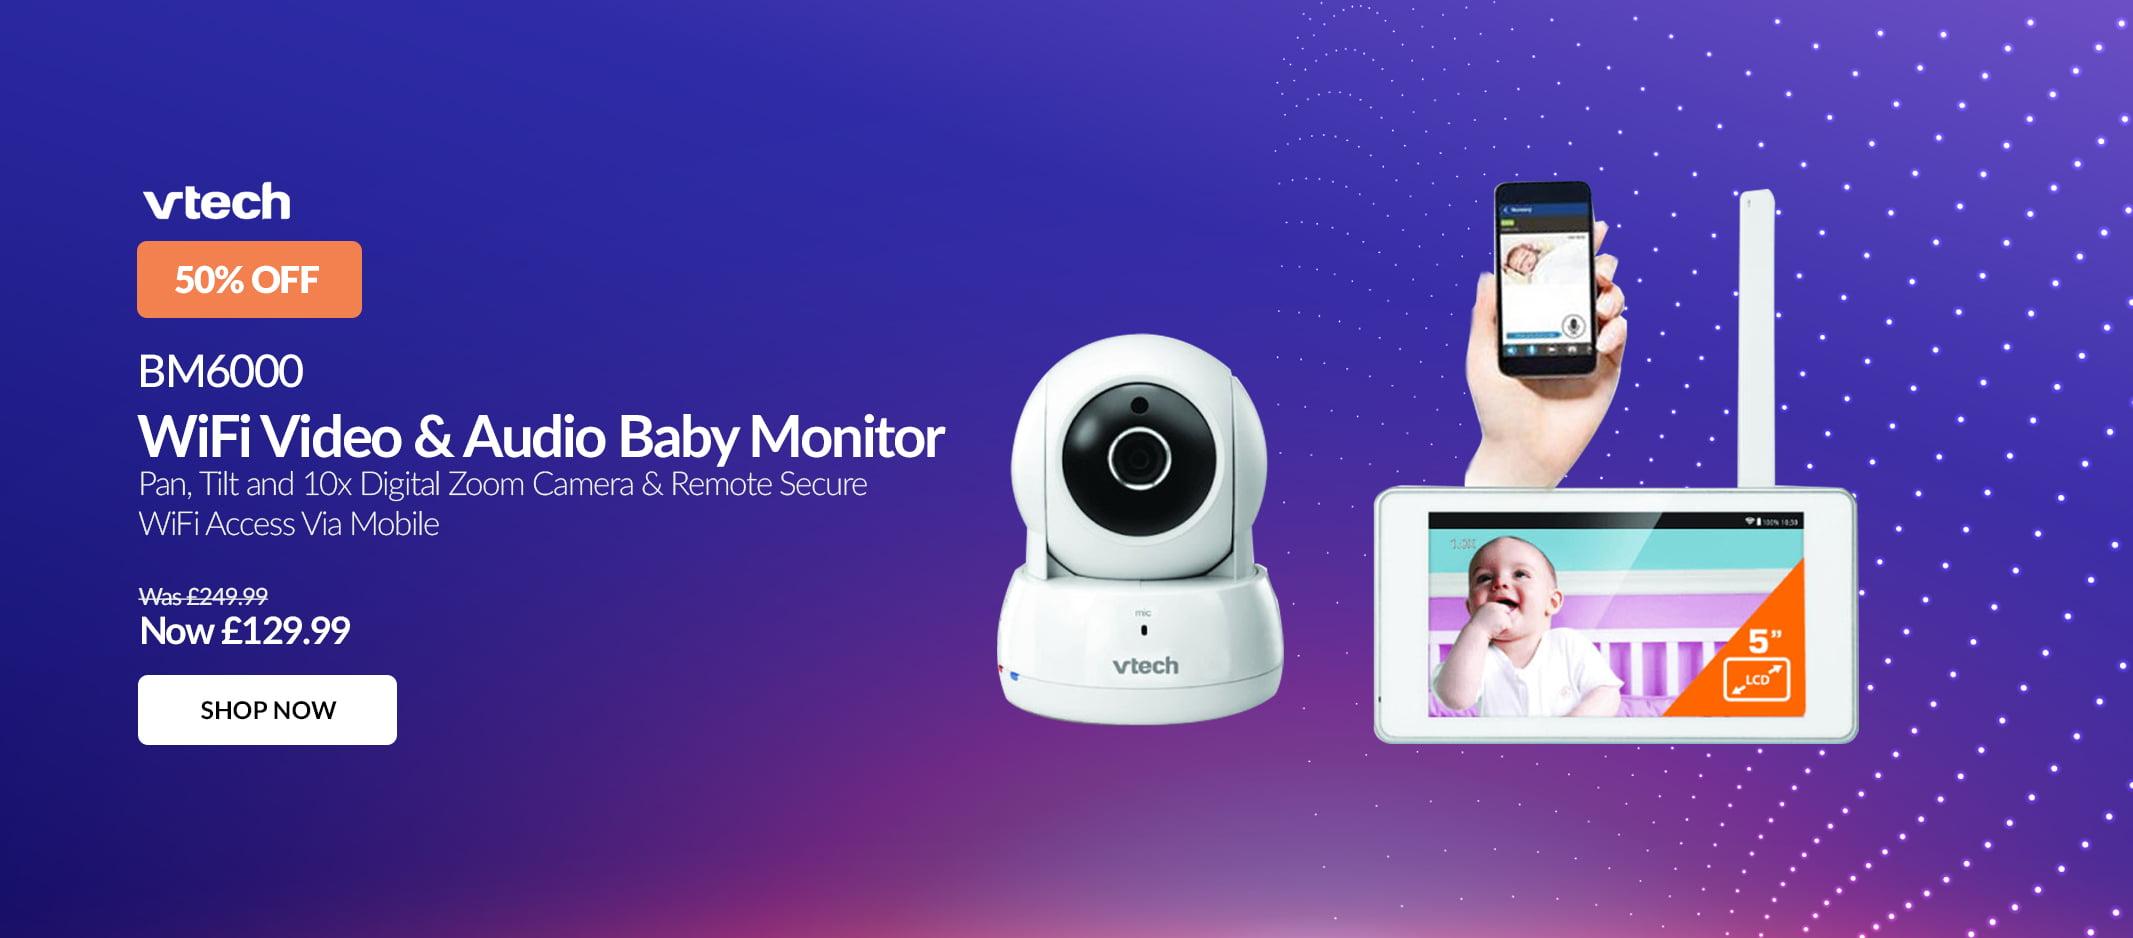 bm6000 Baby Monitor